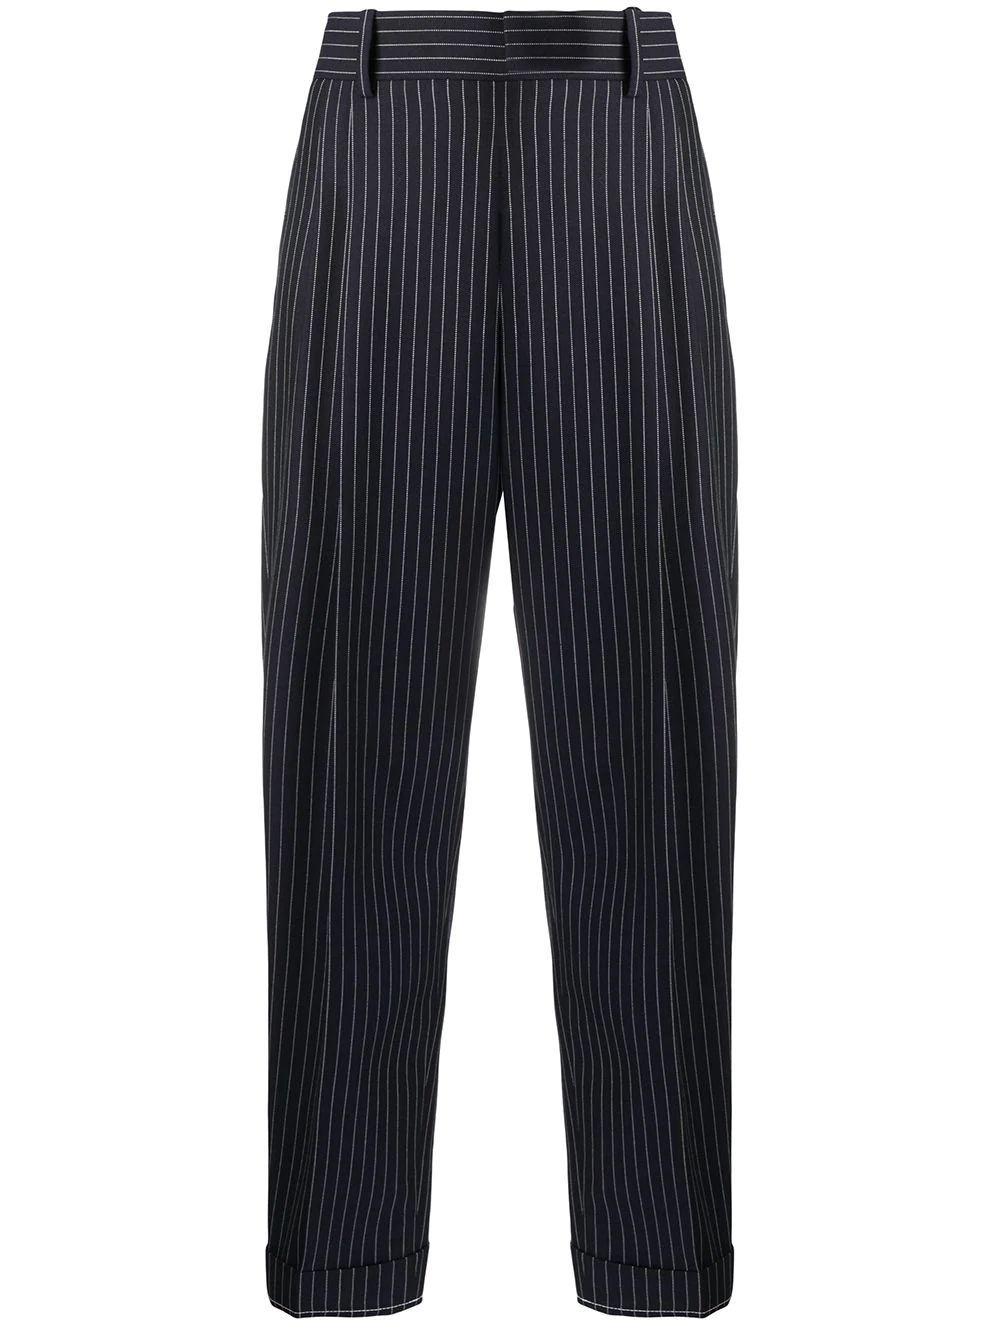 Summer Pinstripe Wool Cuffed Trouser Item # CHC20UPA18063